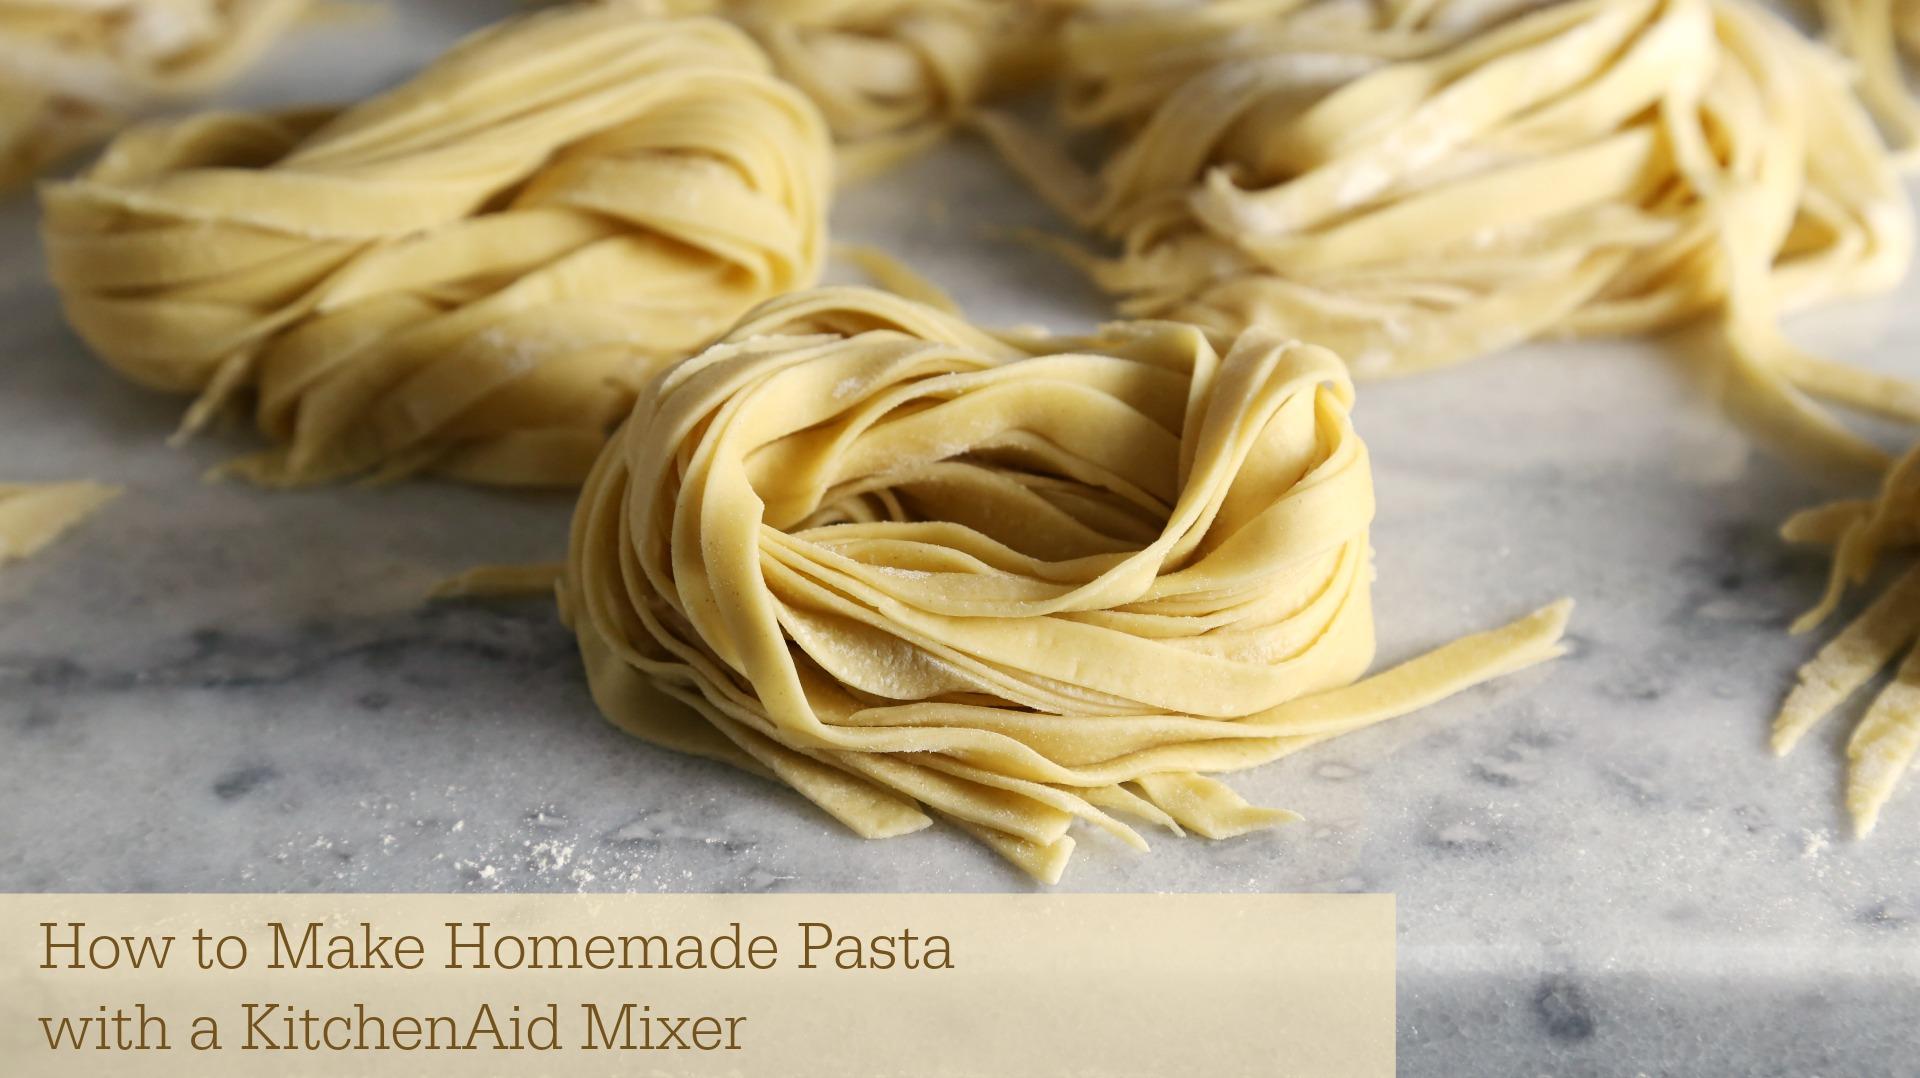 How to make Homemade Pasta with a KitchenAid Mixer youtube